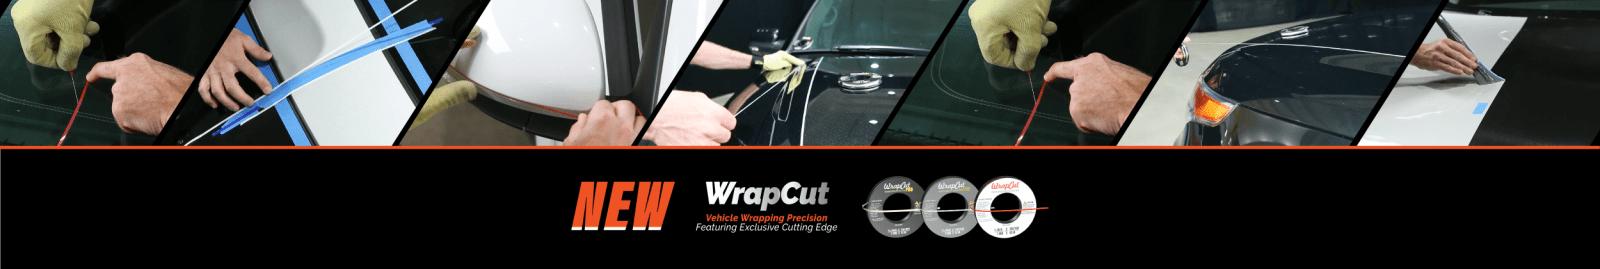 Wrap Cut Edge Tape